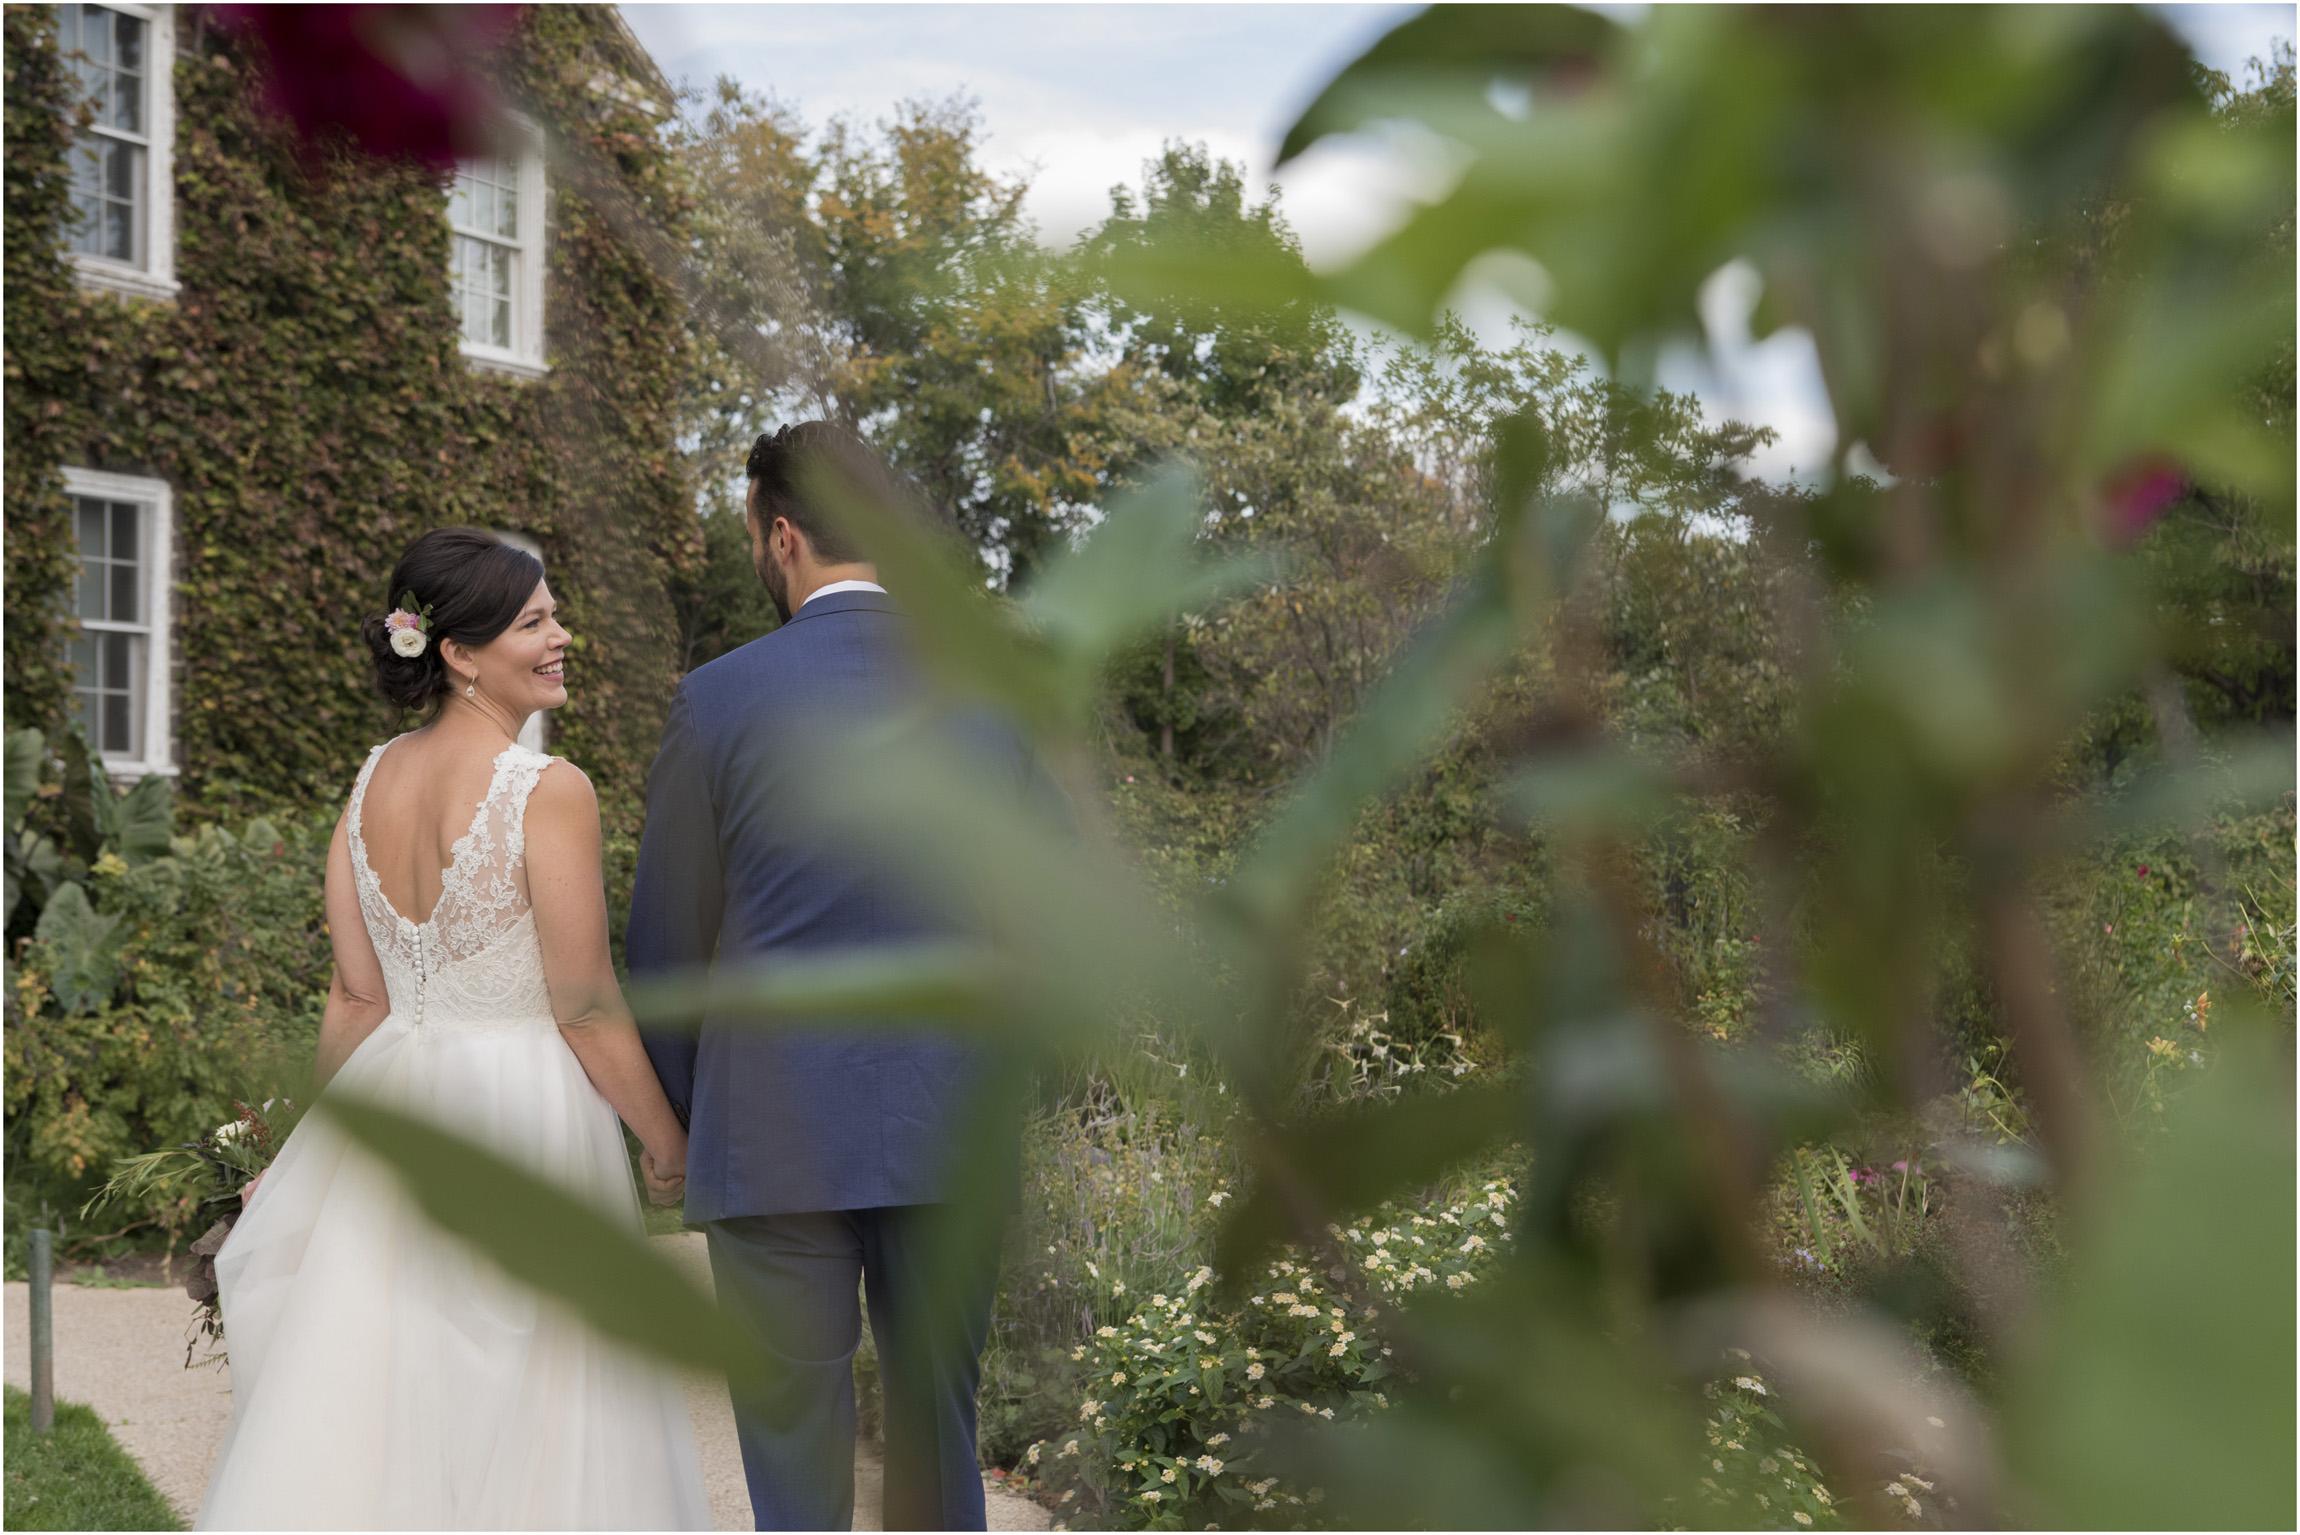 ©FianderFoto_Melissa_Mark_Wedding_Maryland_021.jpg